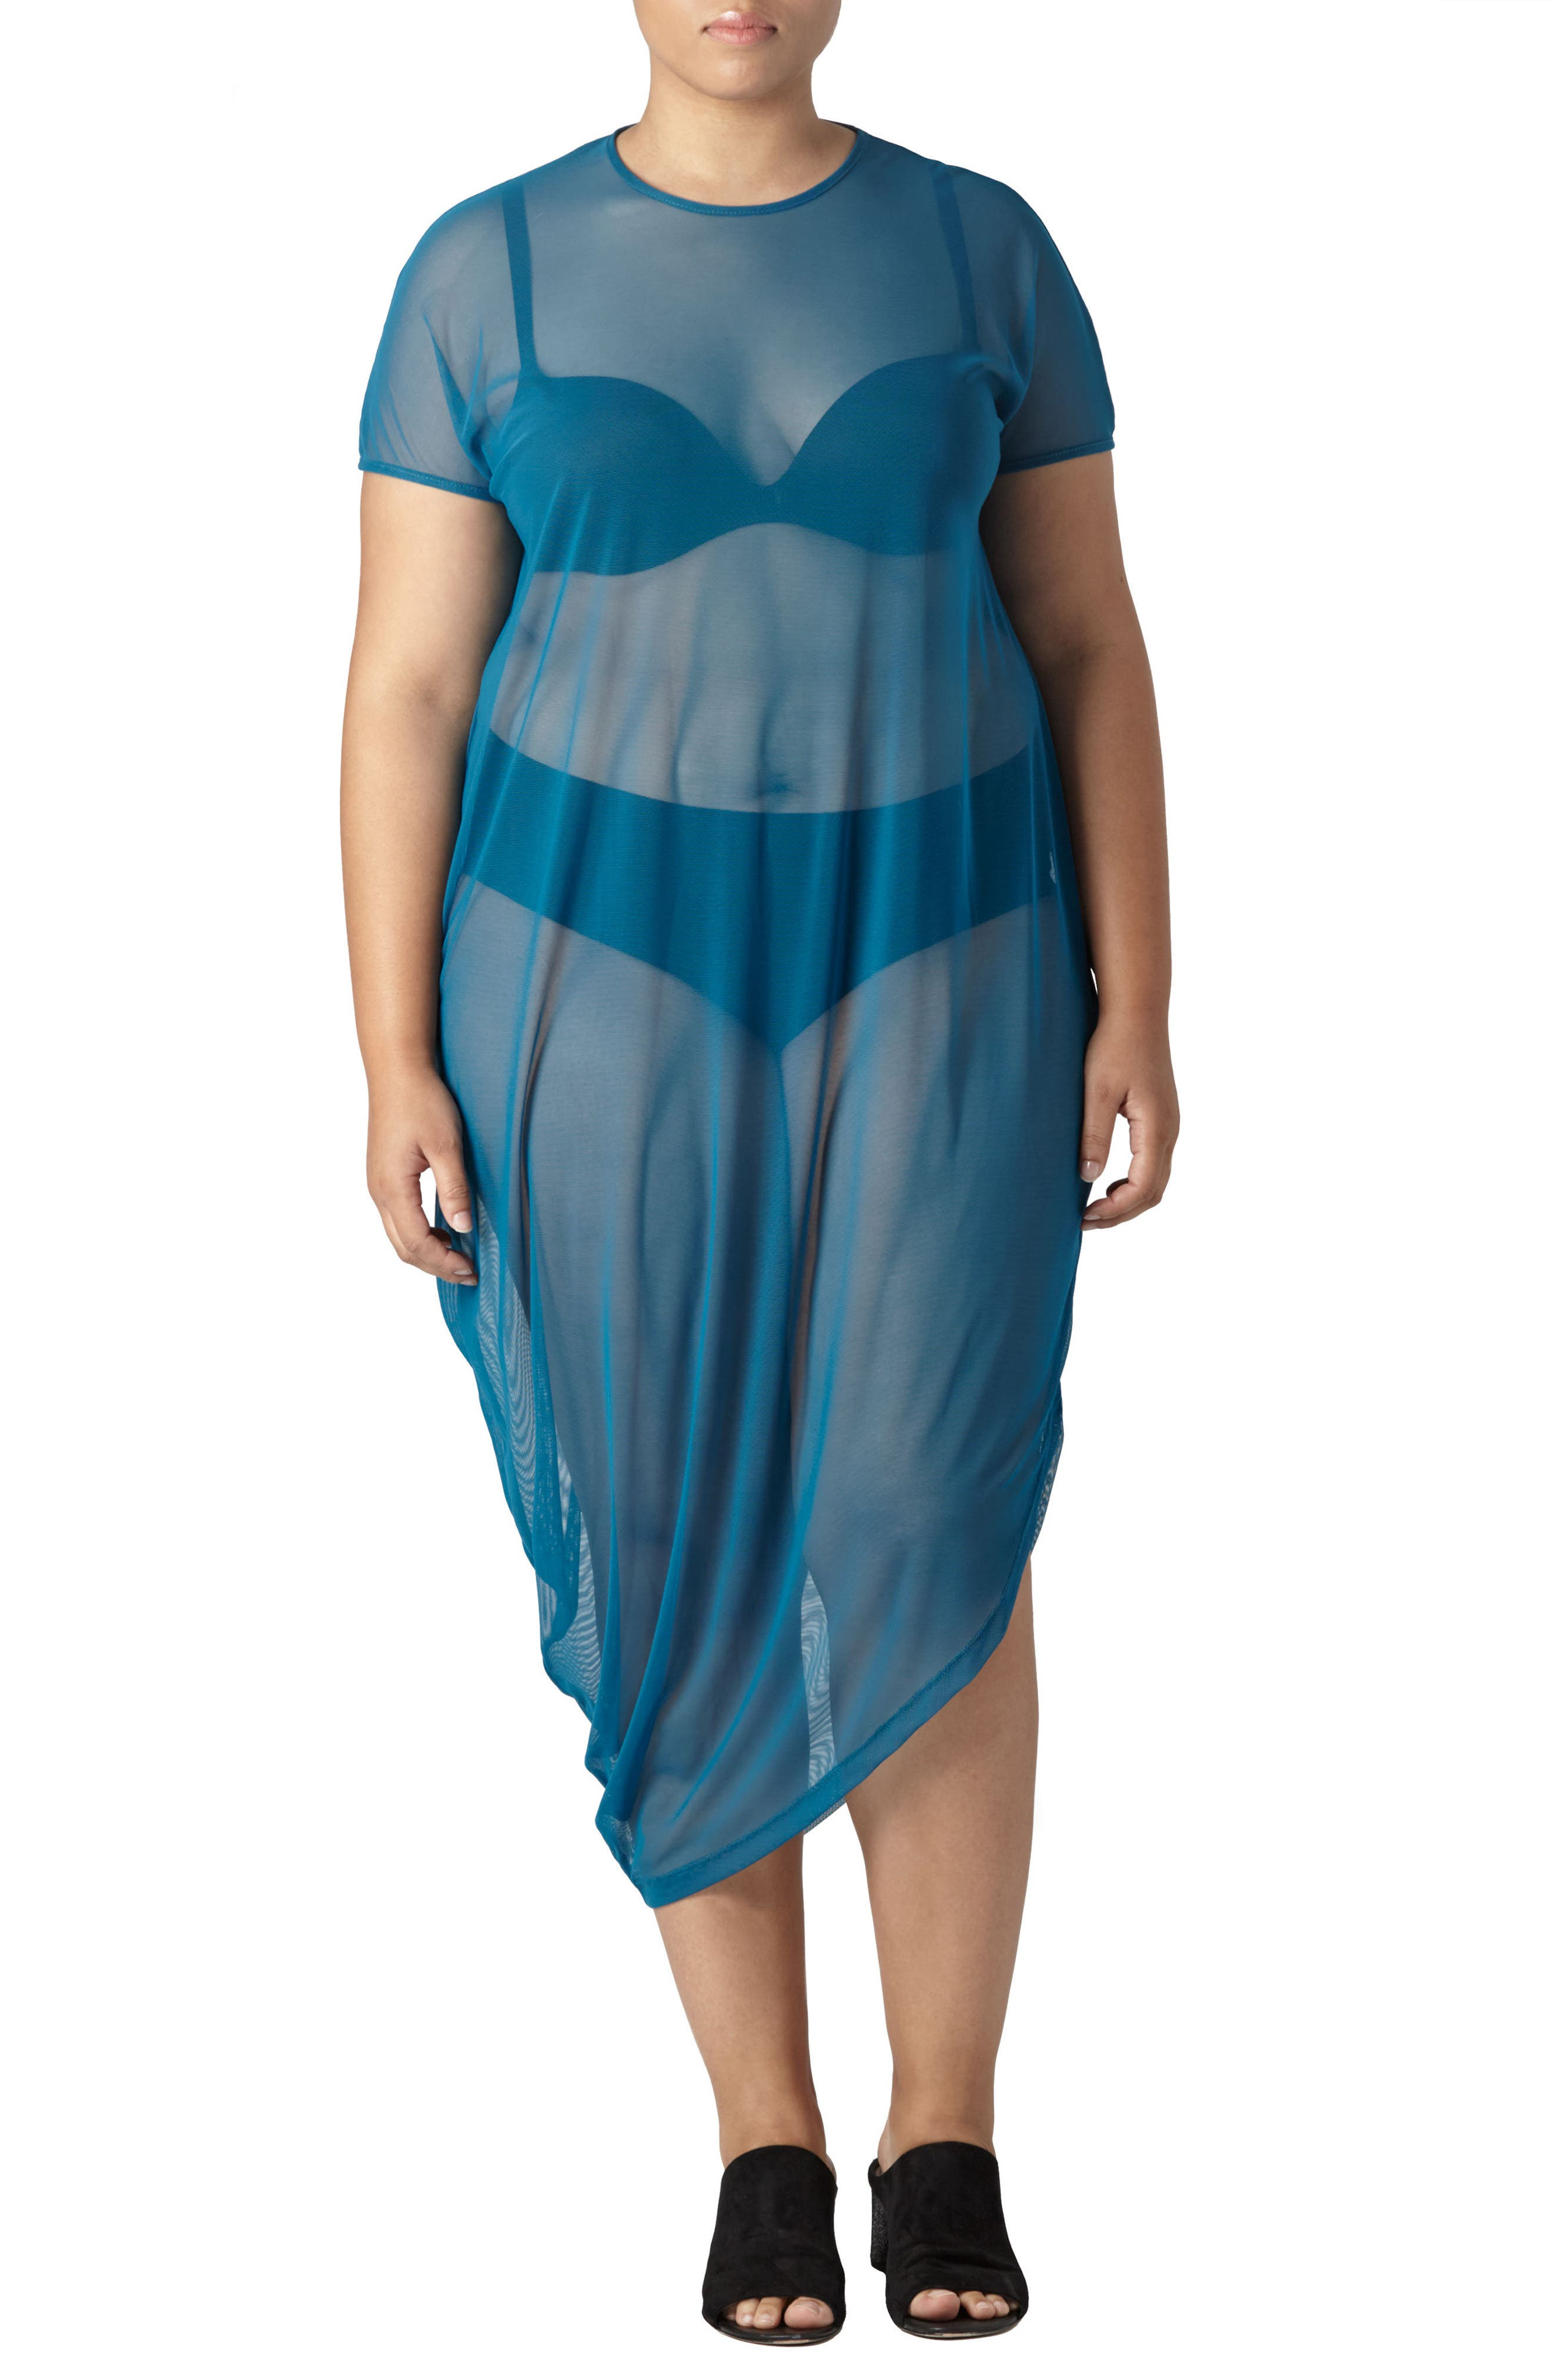 Alternate Image 1 Selected - UNIVERSAL STANDARD Geneva Fog Dress (Plus Size)